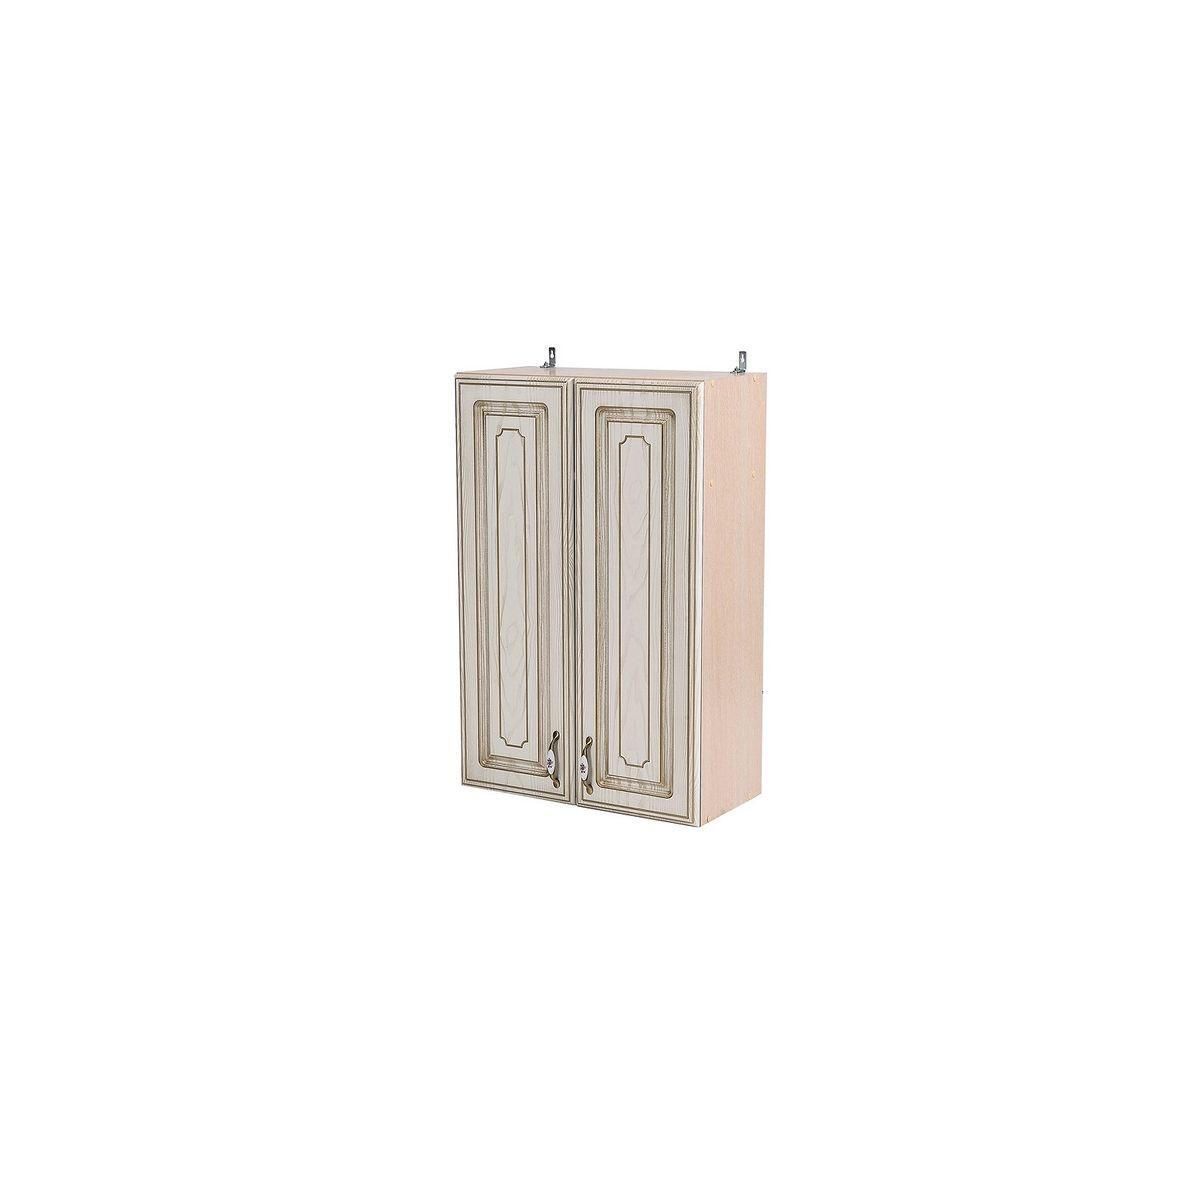 Шкаф навесной ШКН 600 Анжелика